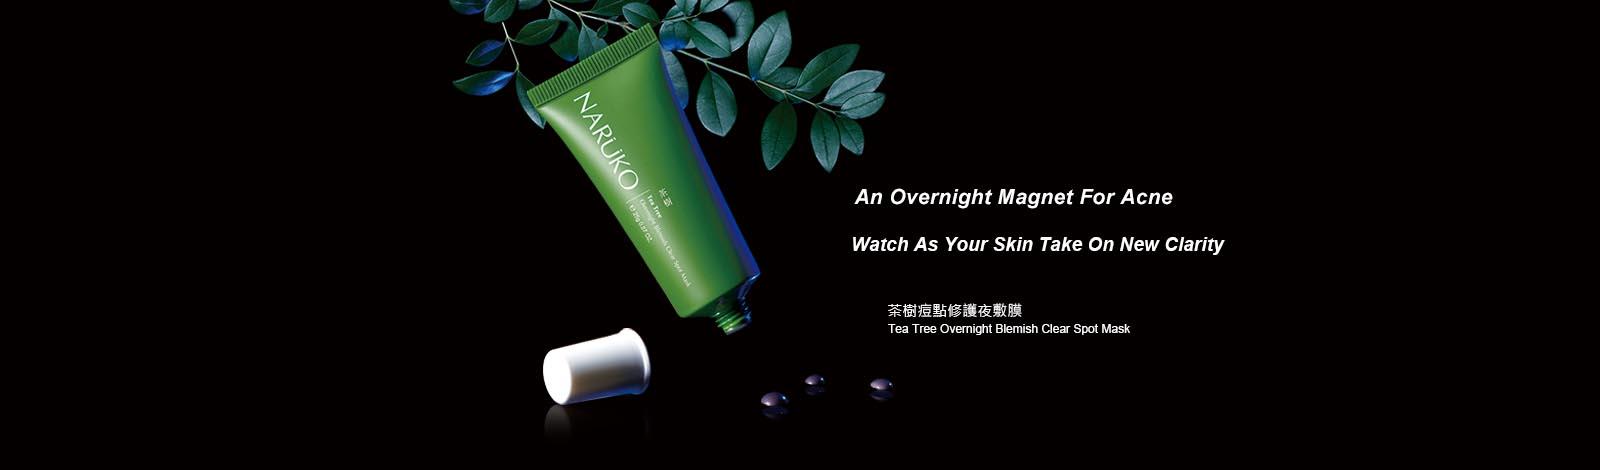 tea-tree-overnight-blemish-clear-spot-mask-01.jpg